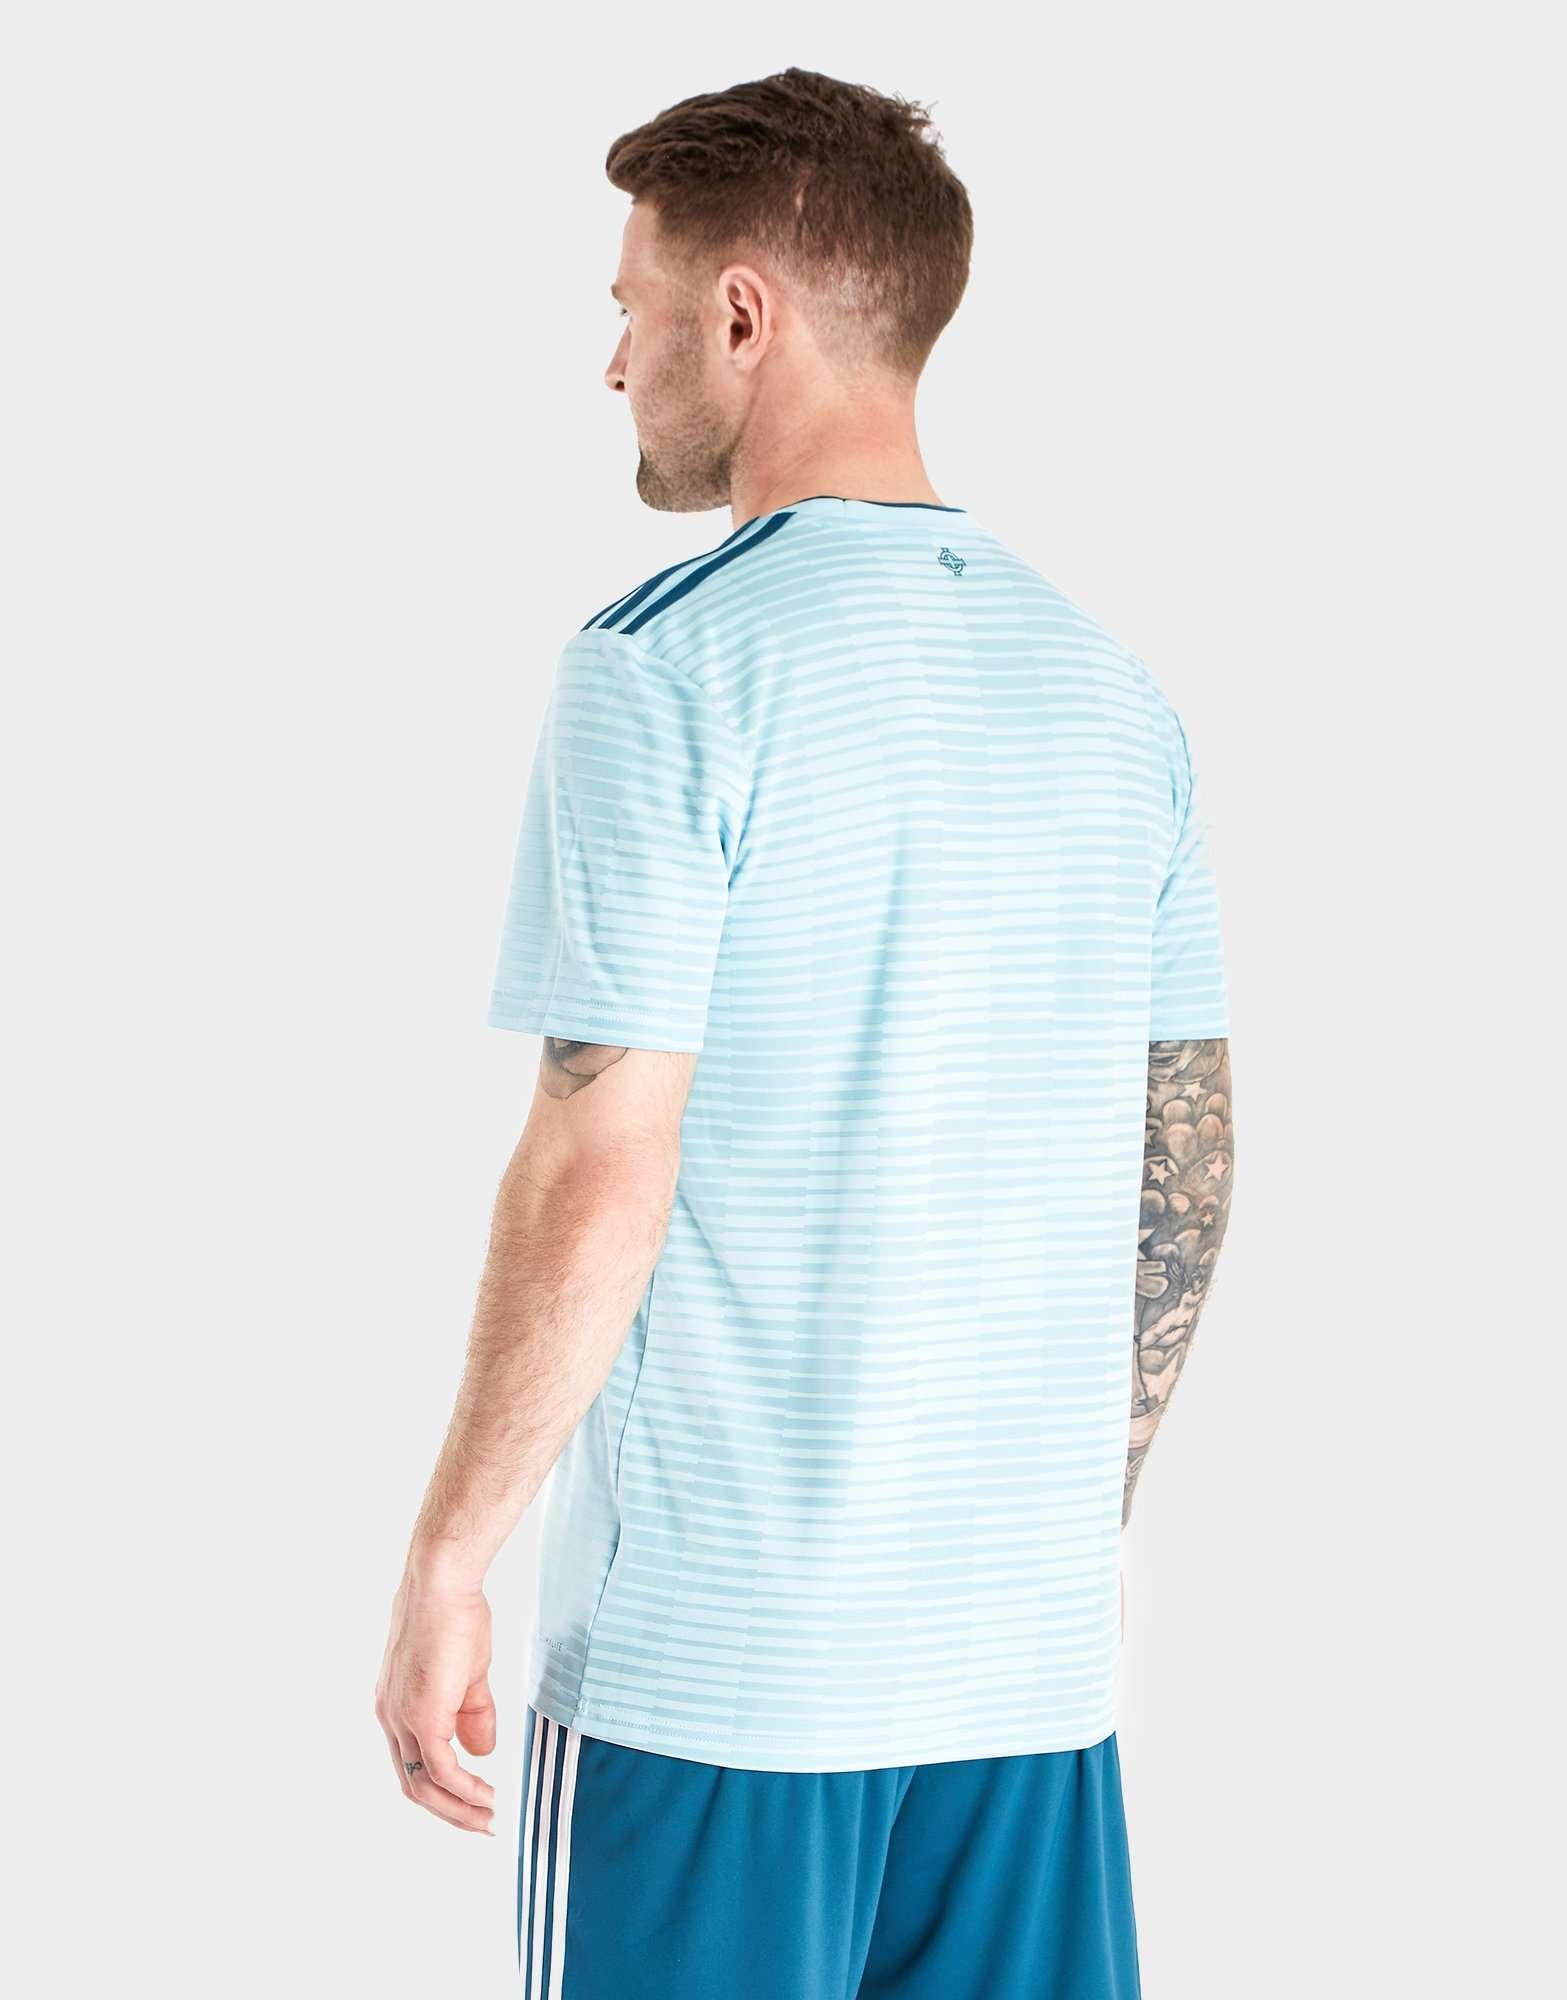 adidas Northern Ireland 2018/19 Away Shirt